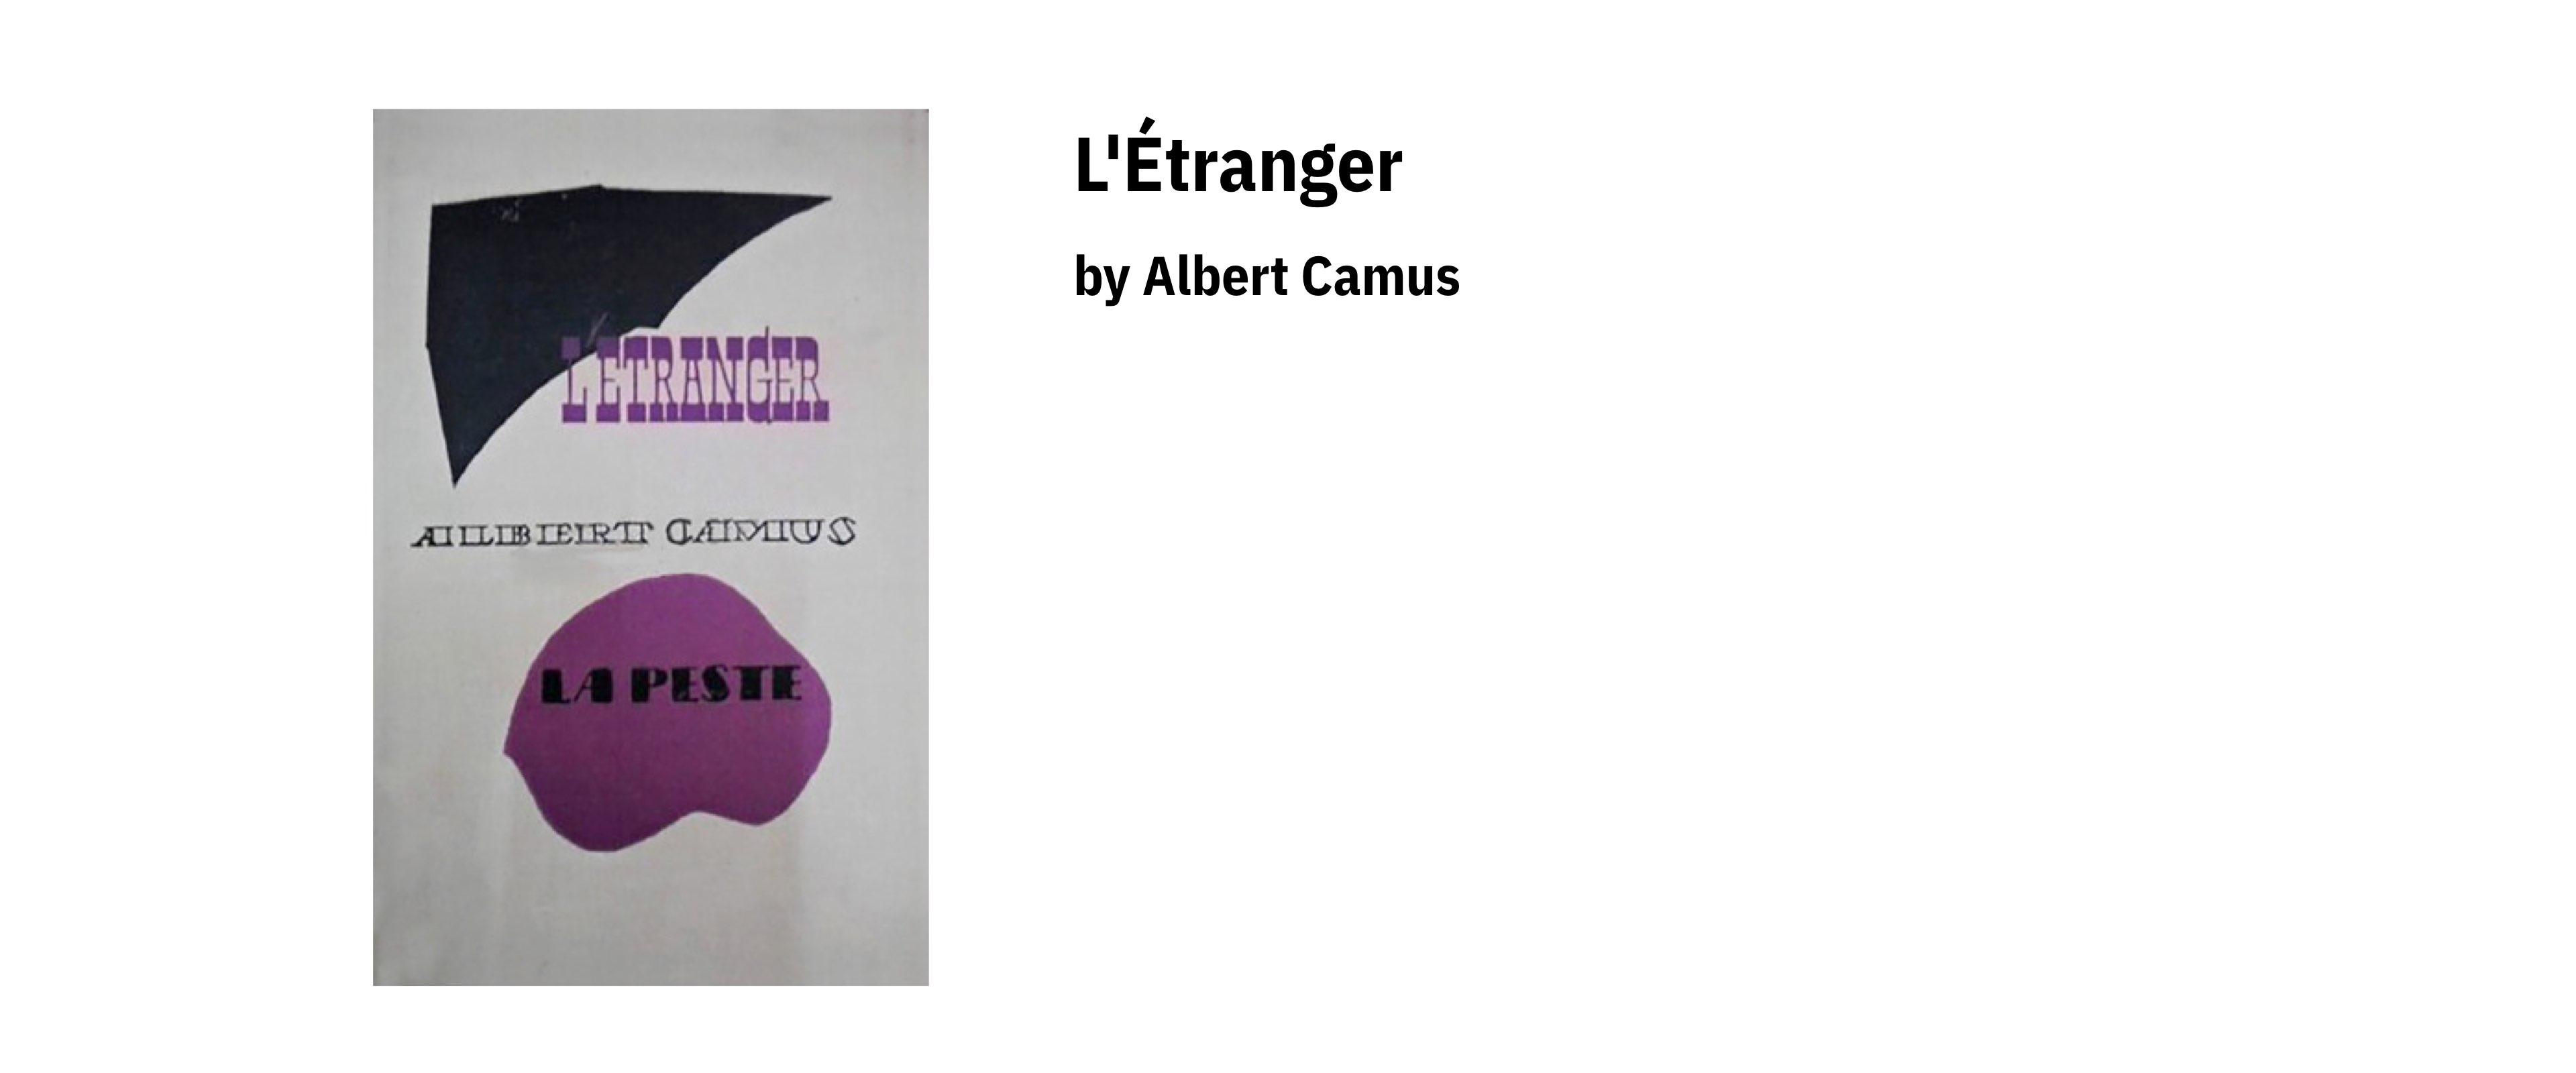 再添几本有关新冠的阅读书目 - The Sociologist